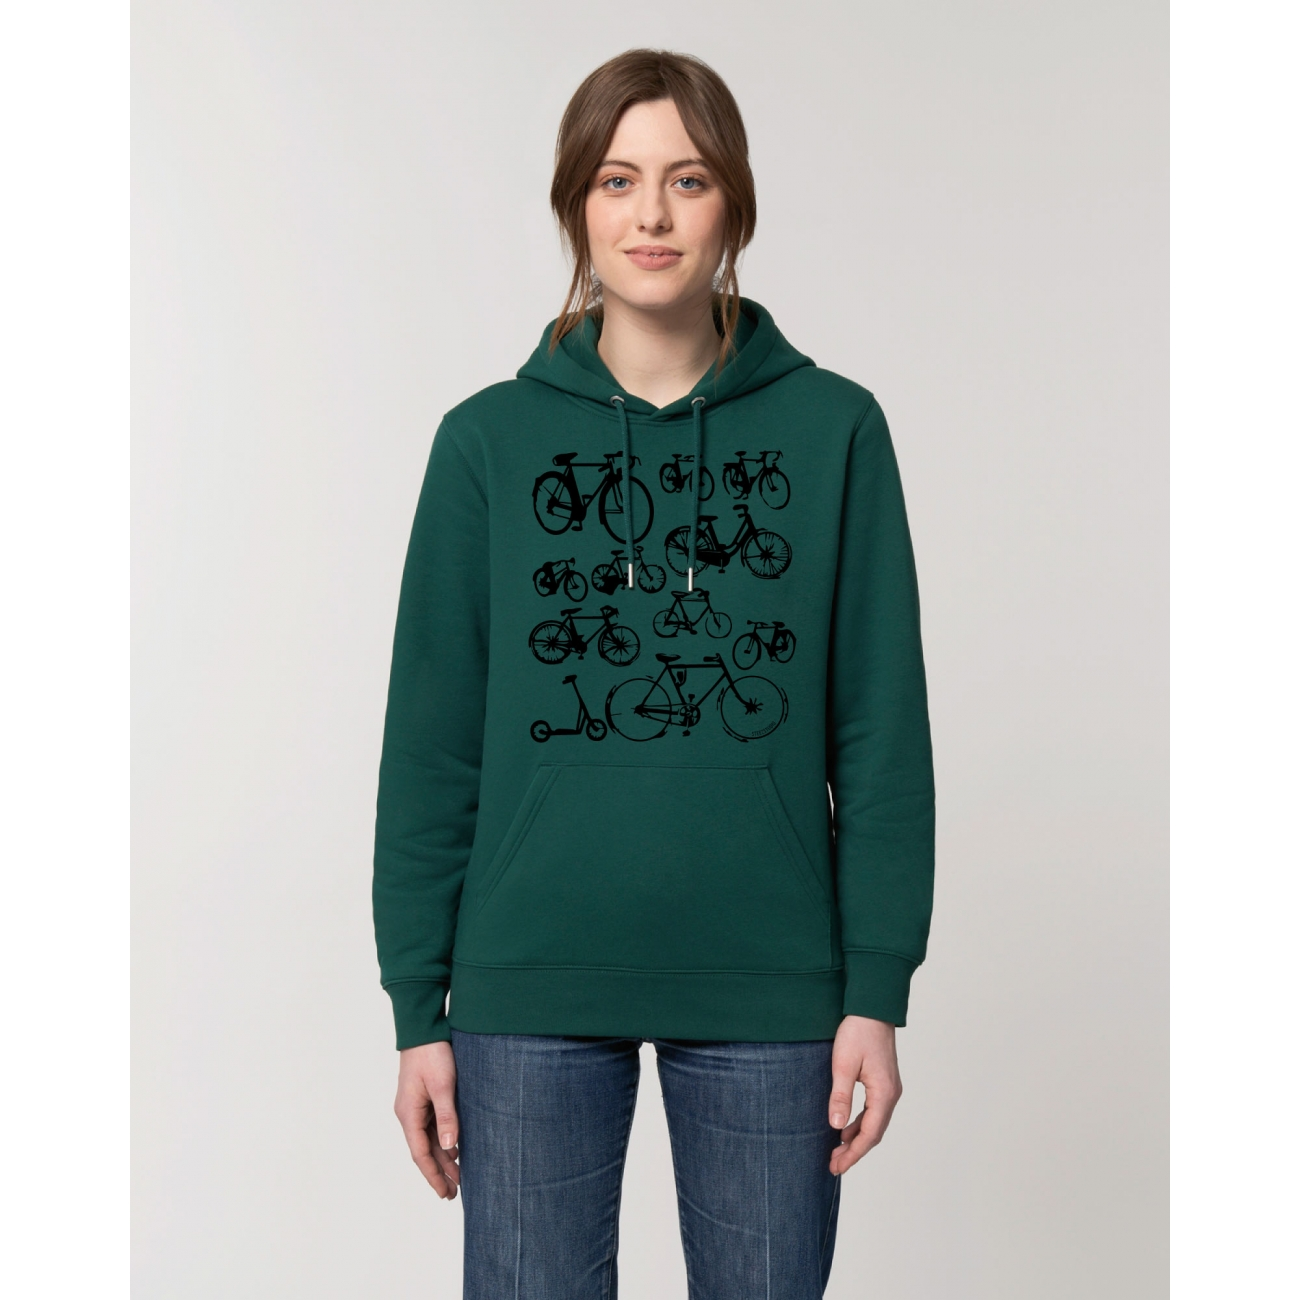 https://tee-shirt-bio.com/10461-thickbox_default/sweat-shirt-femme-capuche-epais-et-interieur-doux-coton-bio-velos-vert-sapin.jpg